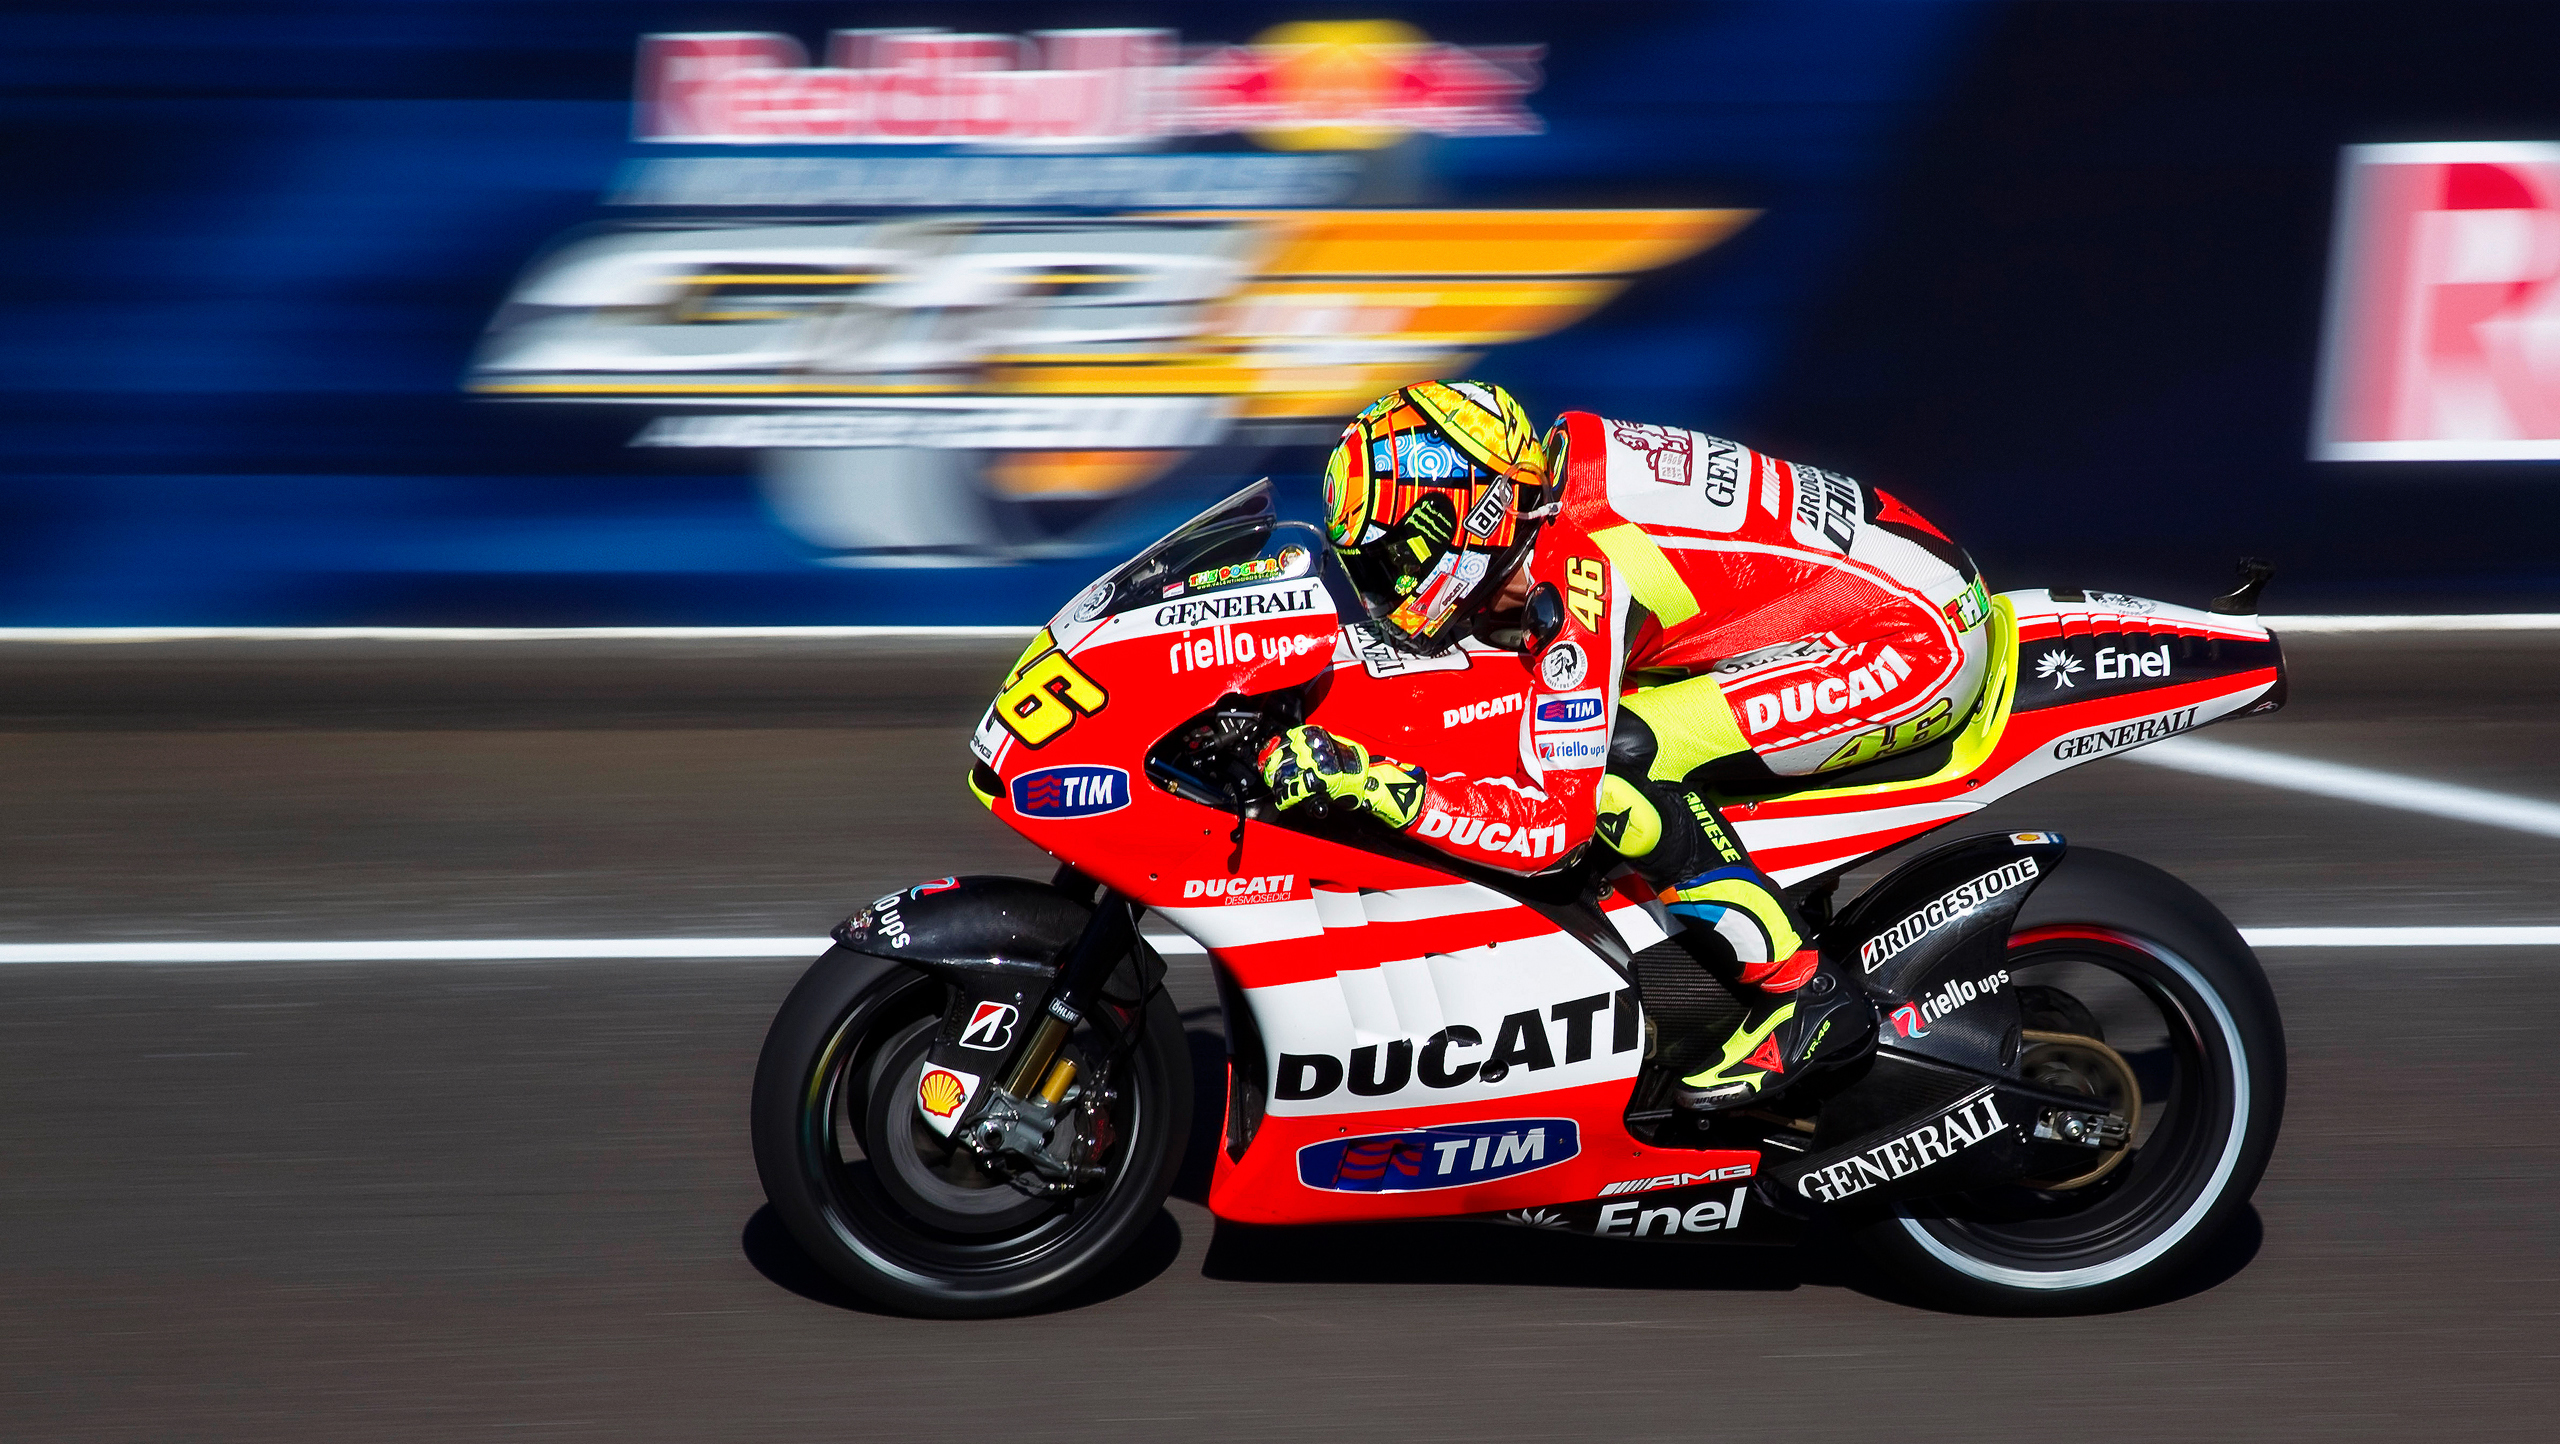 Sports motogp indianapolis indy motogp red bull moto ducati 2560x1444